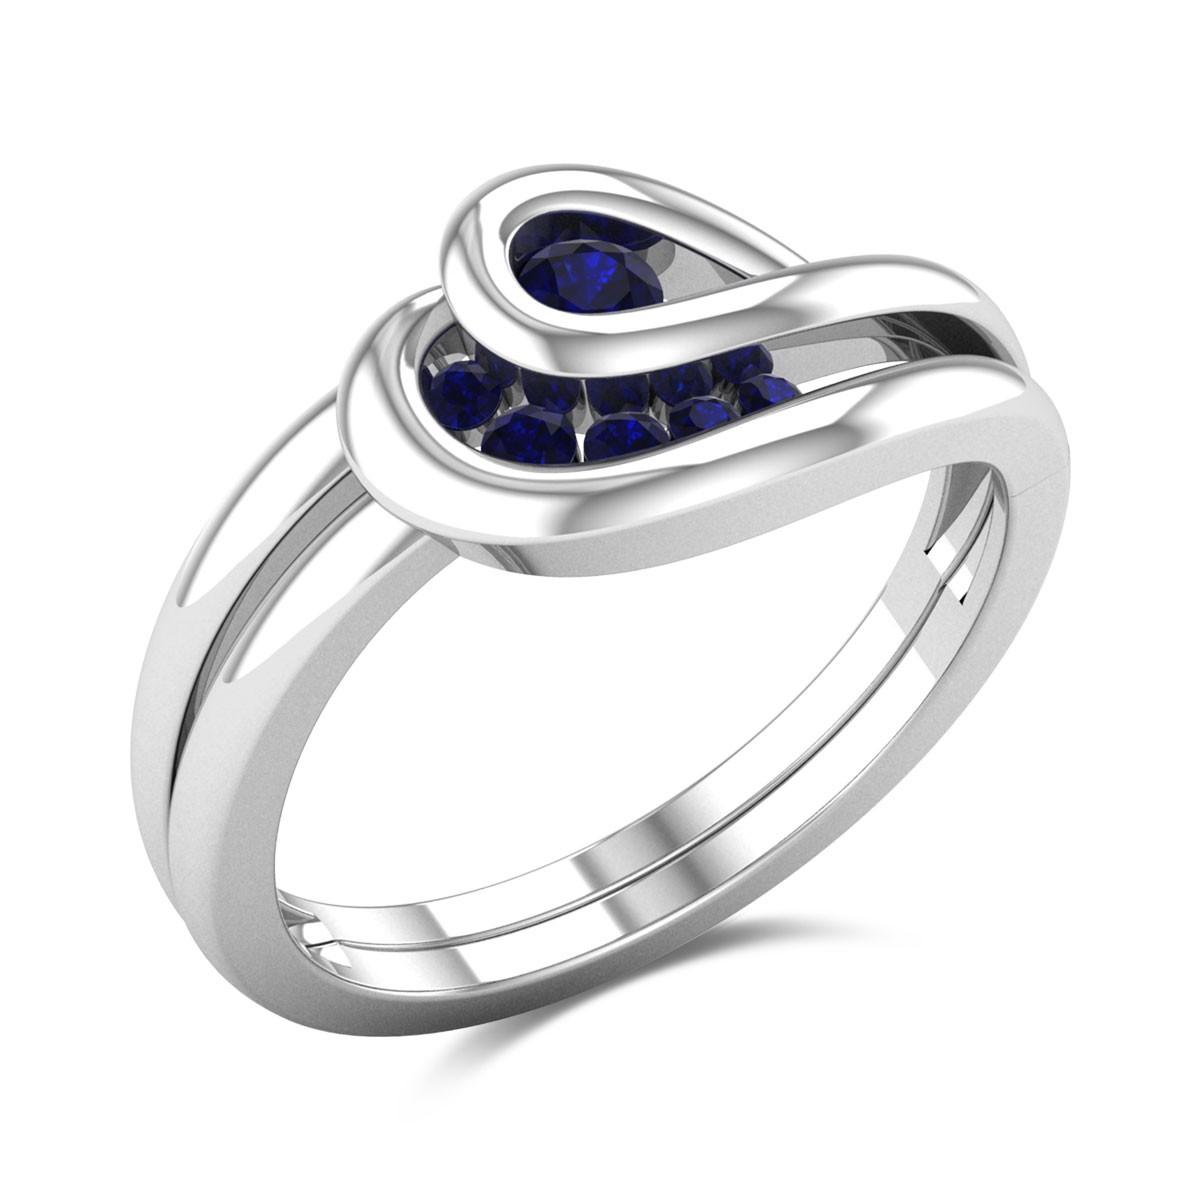 Interlaced Royal Sapphire Gemstone Ring